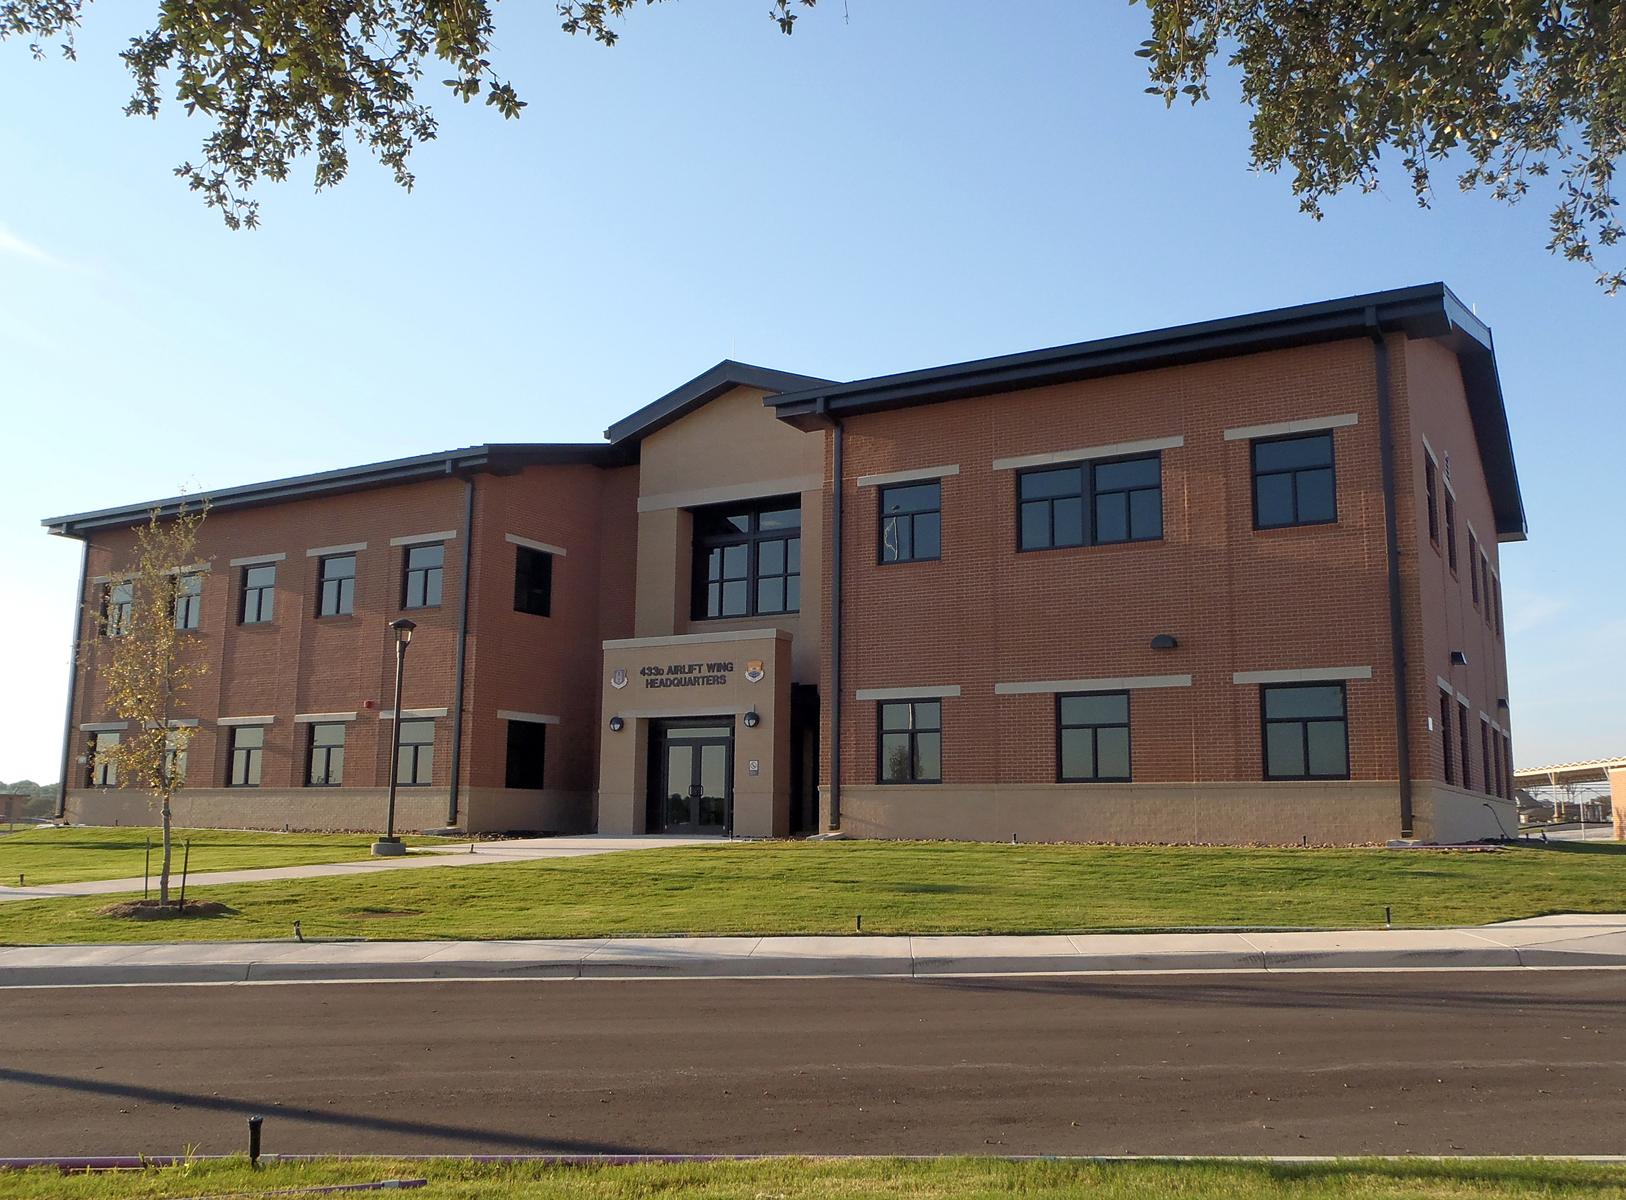 Knight rchitects, Inc. : News - ^